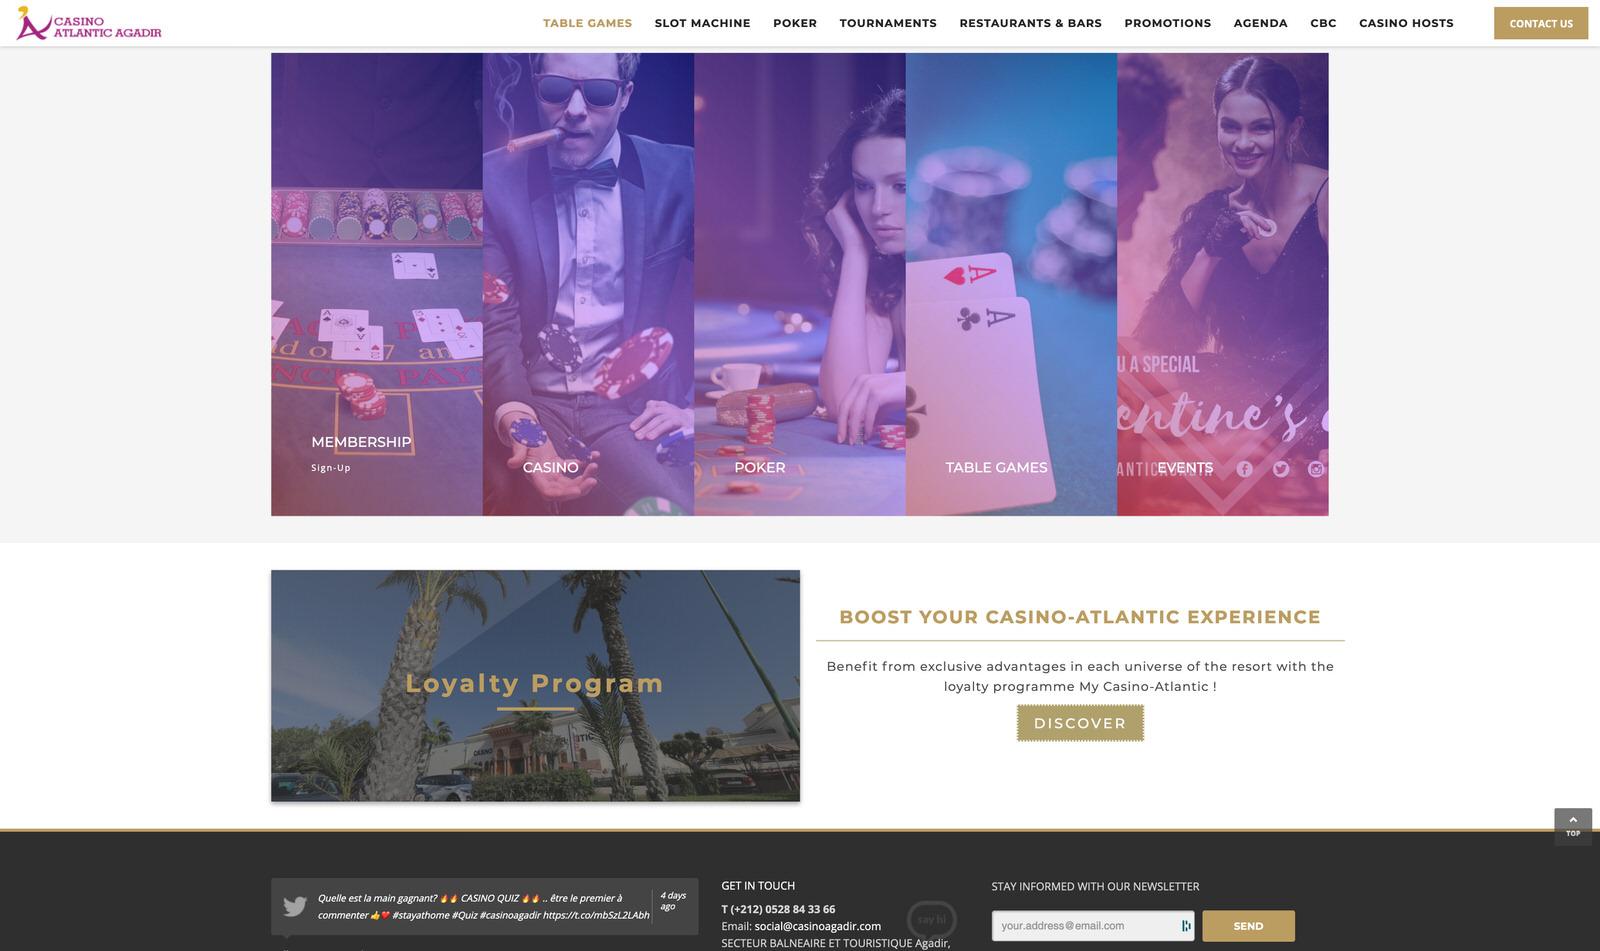 iCom-Agence-de-Communication-au-Maroc-Casablanca-creation-site-web-casini-atlantic-agadir2020-05-25 at 11.39.27 PM 6